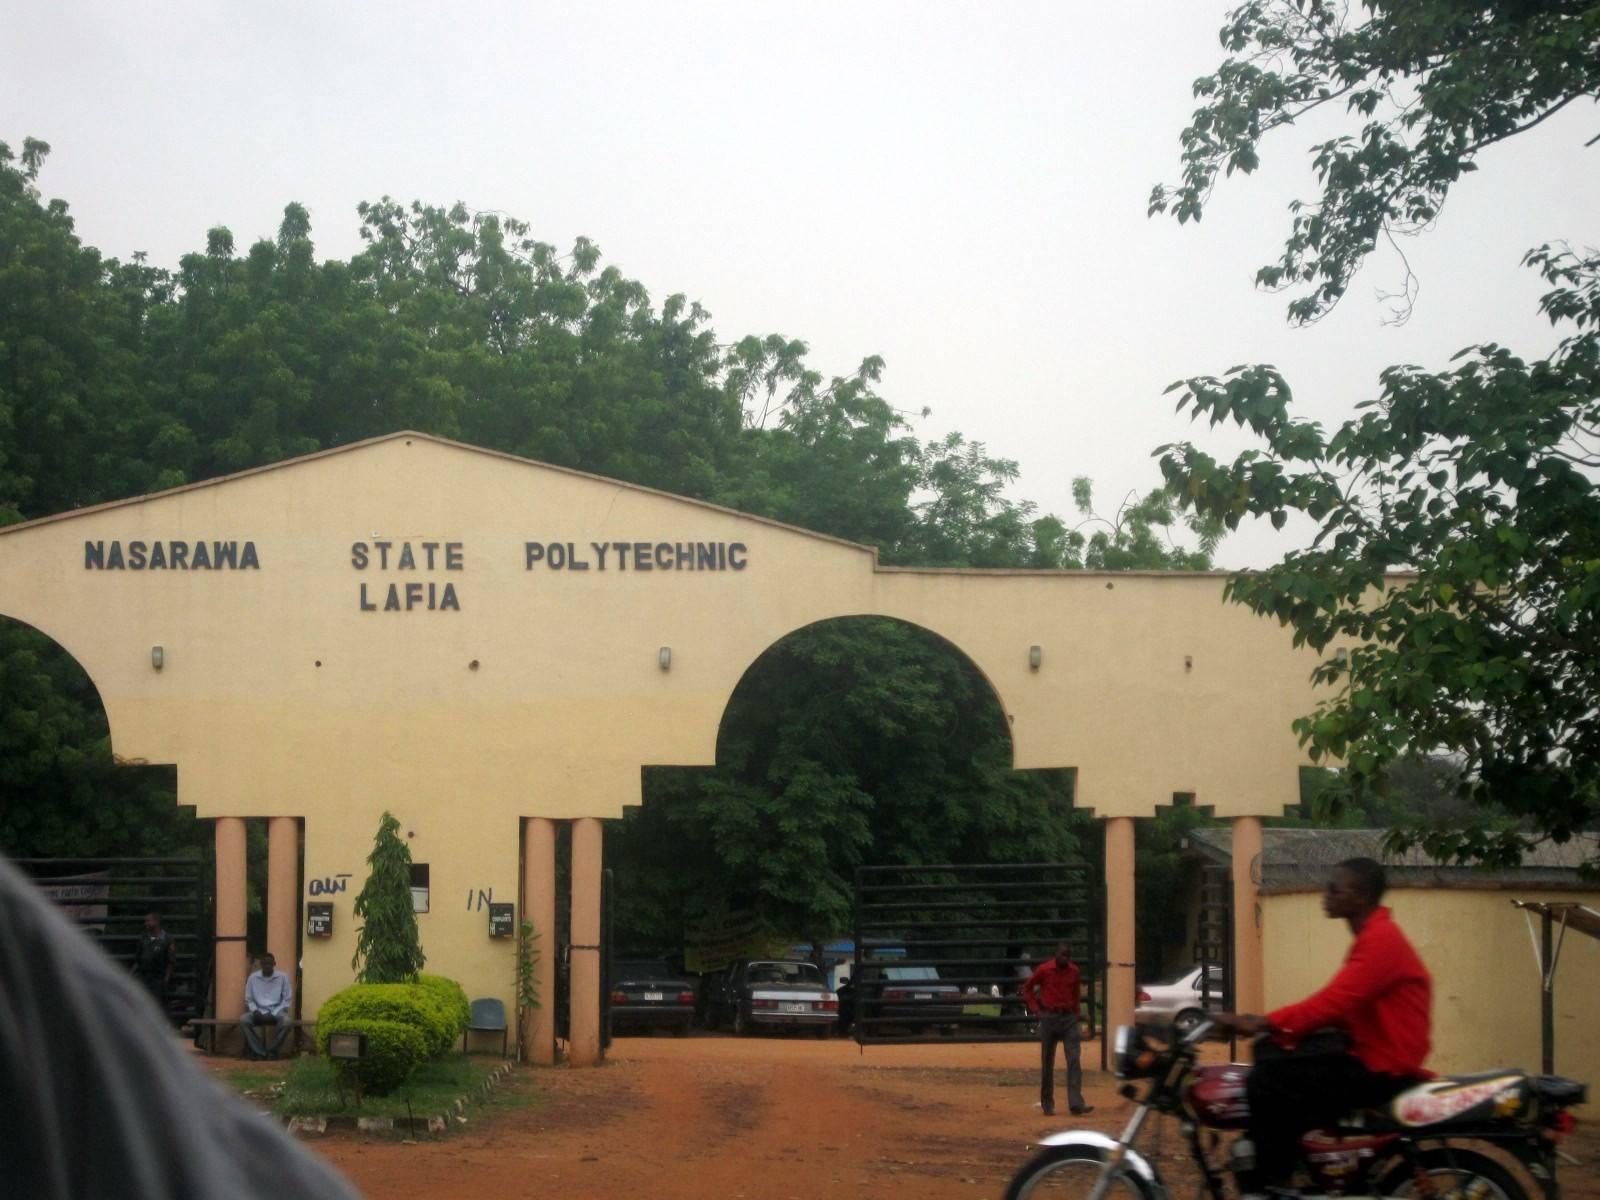 Nasarawa State Polytechnic